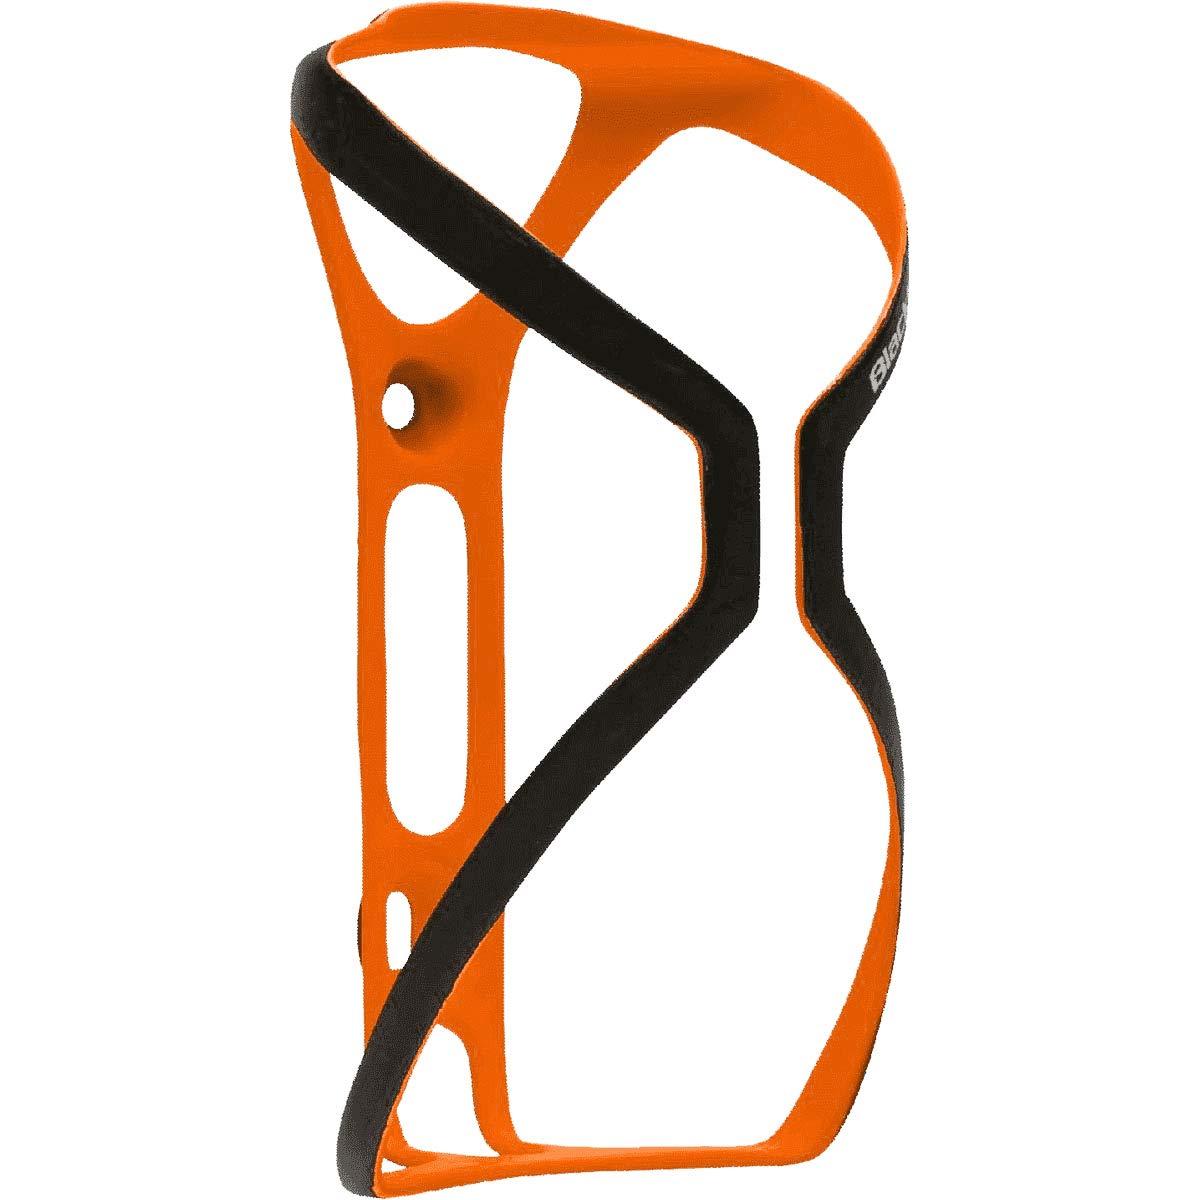 Blackburn シンチカーボンファイバーボトルケージ One Size Matte Bright Orange B07H3SB3W8